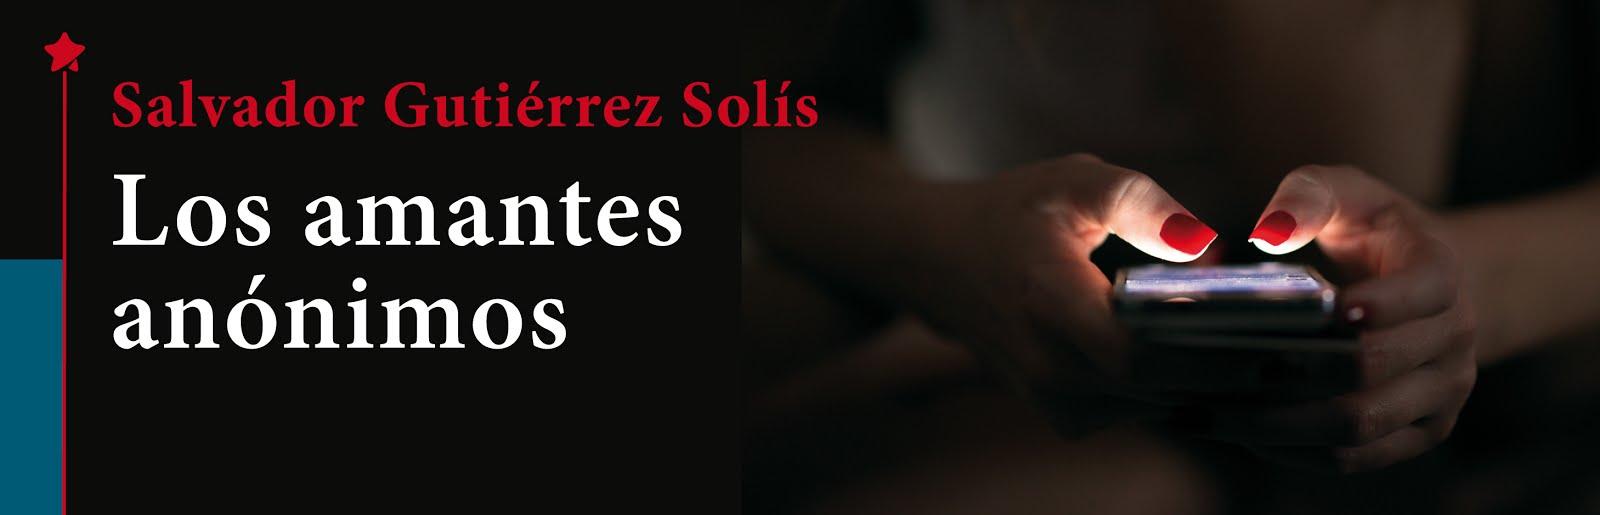 Salvador Gutiérrez Solís